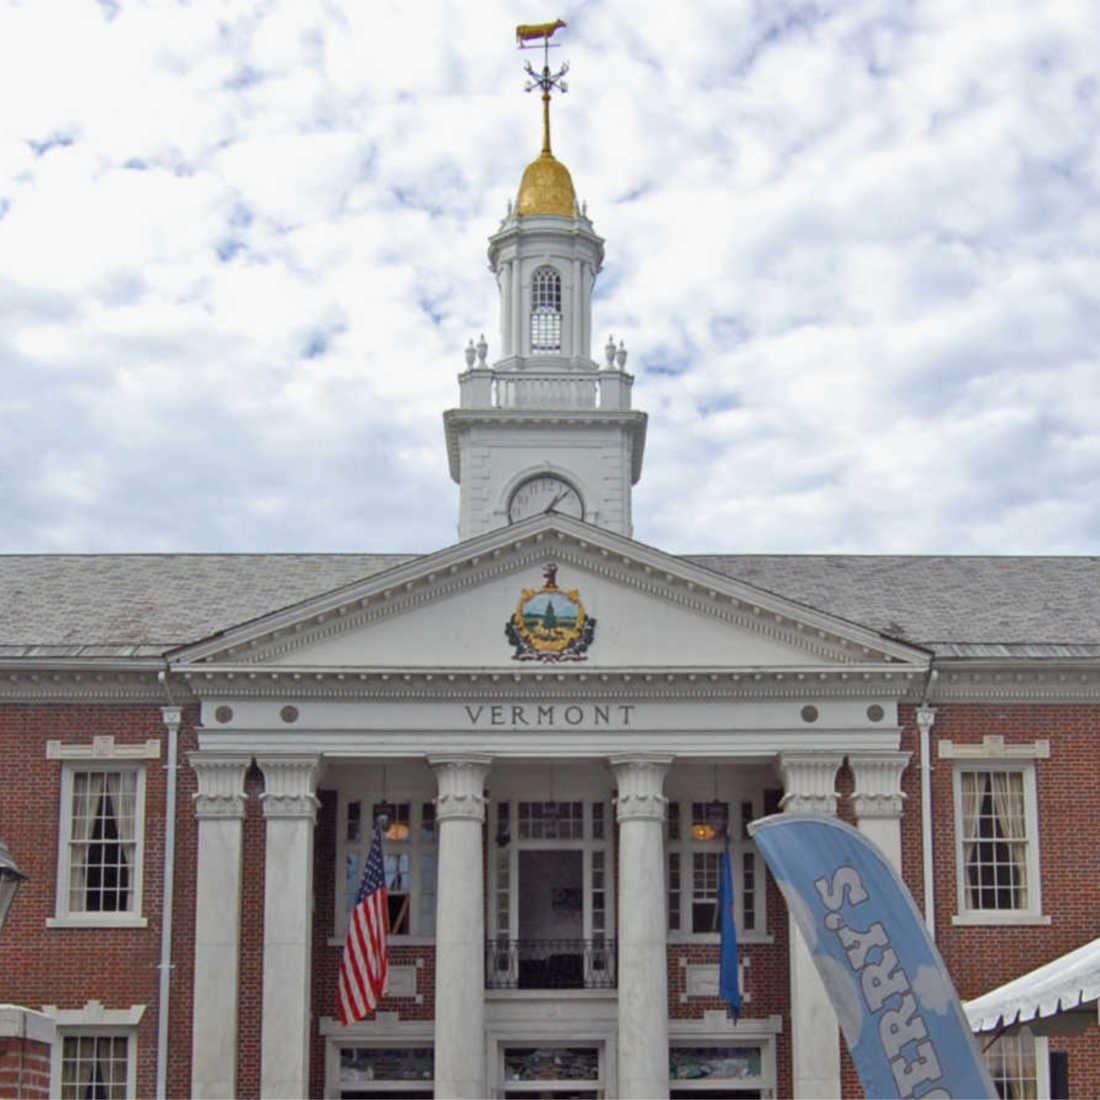 Vermont Day